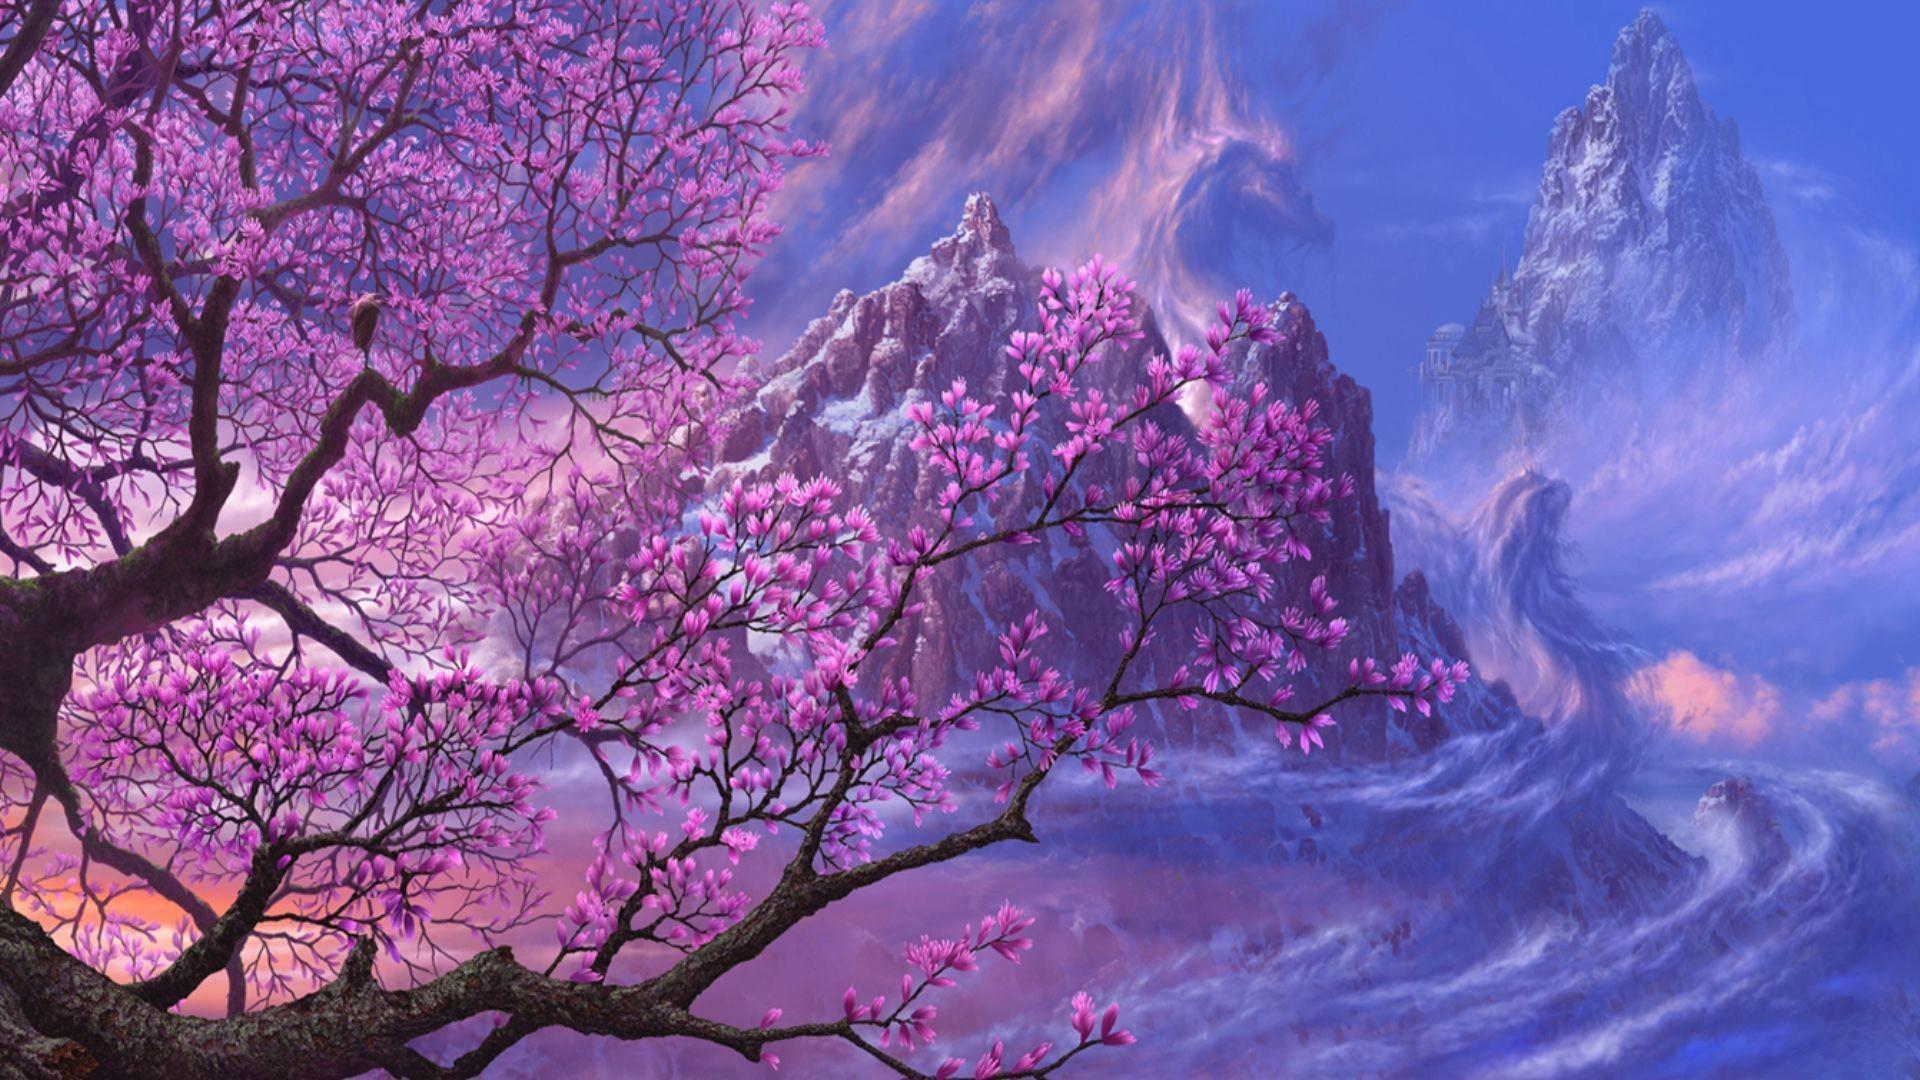 Res: 1920x1080, Anime Artwork Asia Dragons Fantasy Art Purple Trees - Image #3878 -  Licence: Free